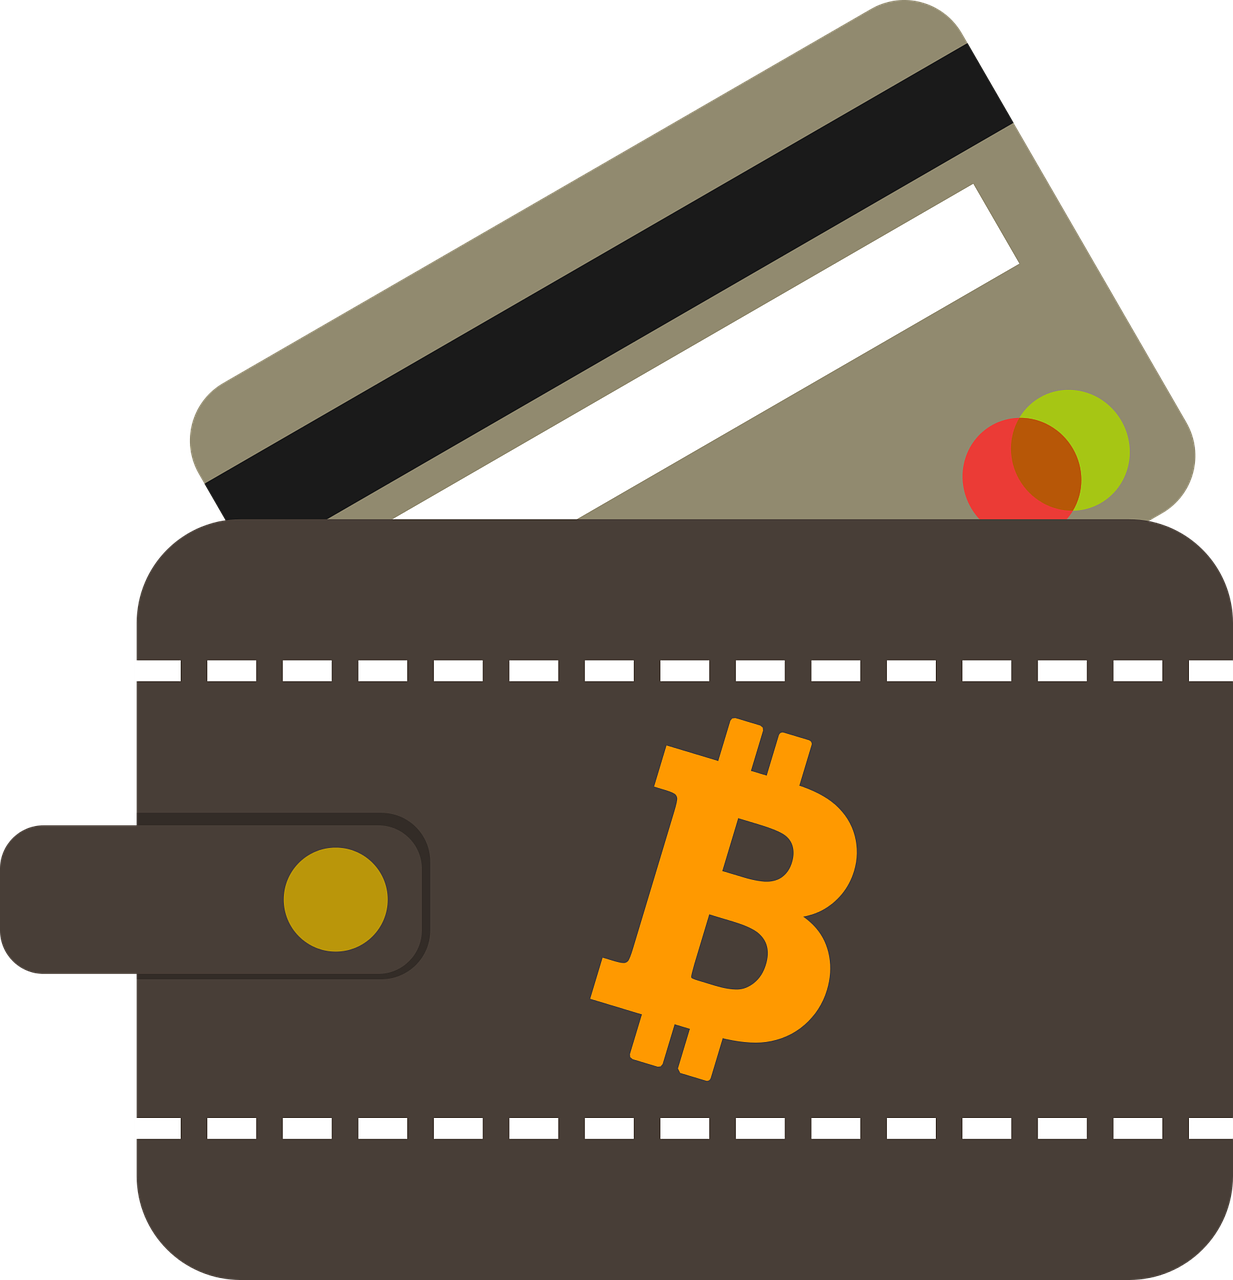 Kriptovalūtu kazino kriptovalūtas maks (cryptocurrency wallet)